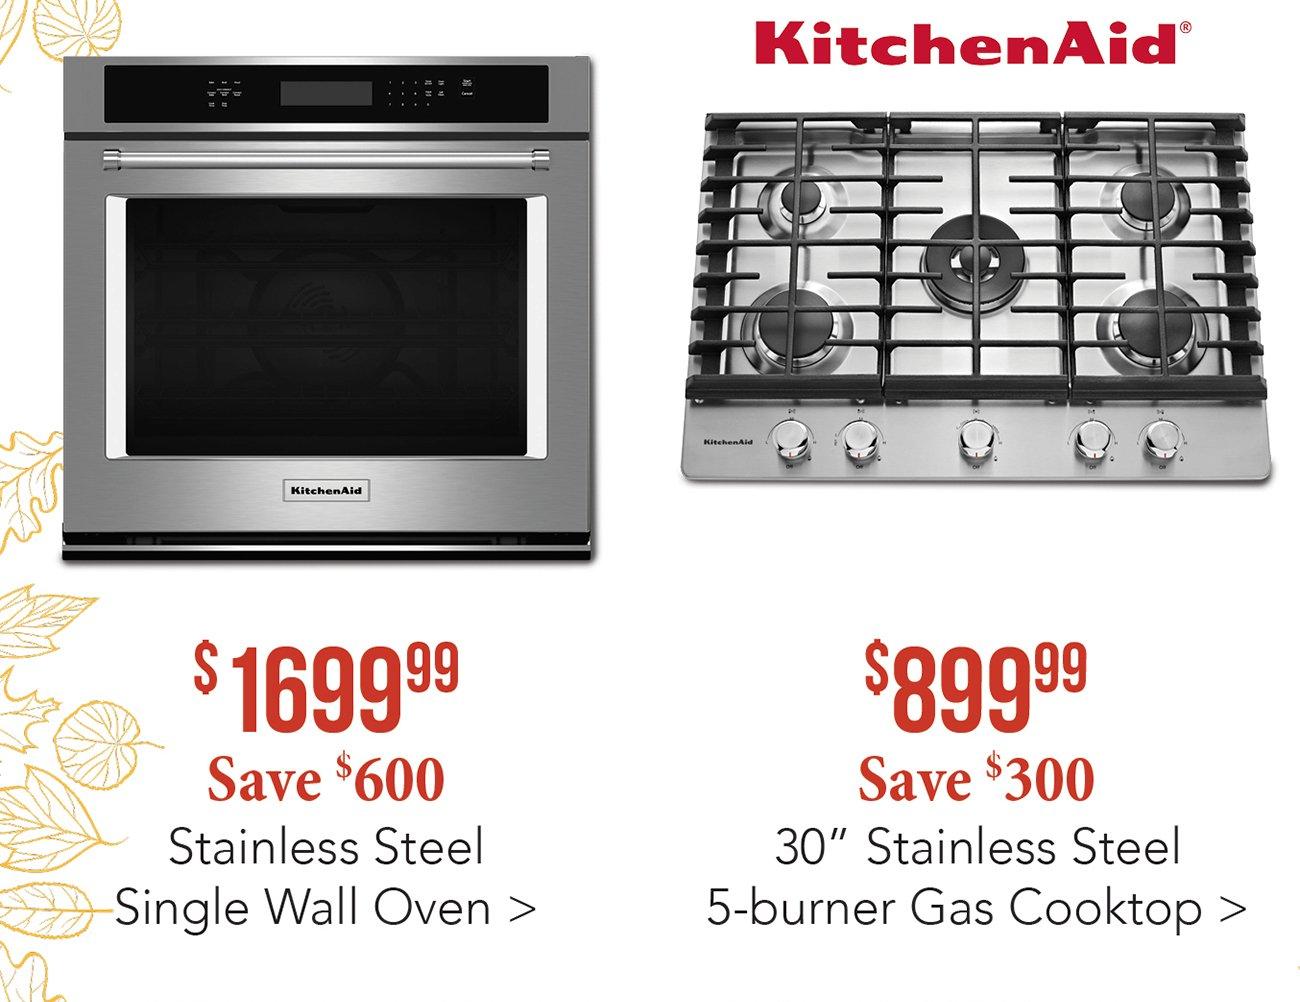 Kitchenaid Wall Oven. Kitchenaid Wall Oven And Cooktop